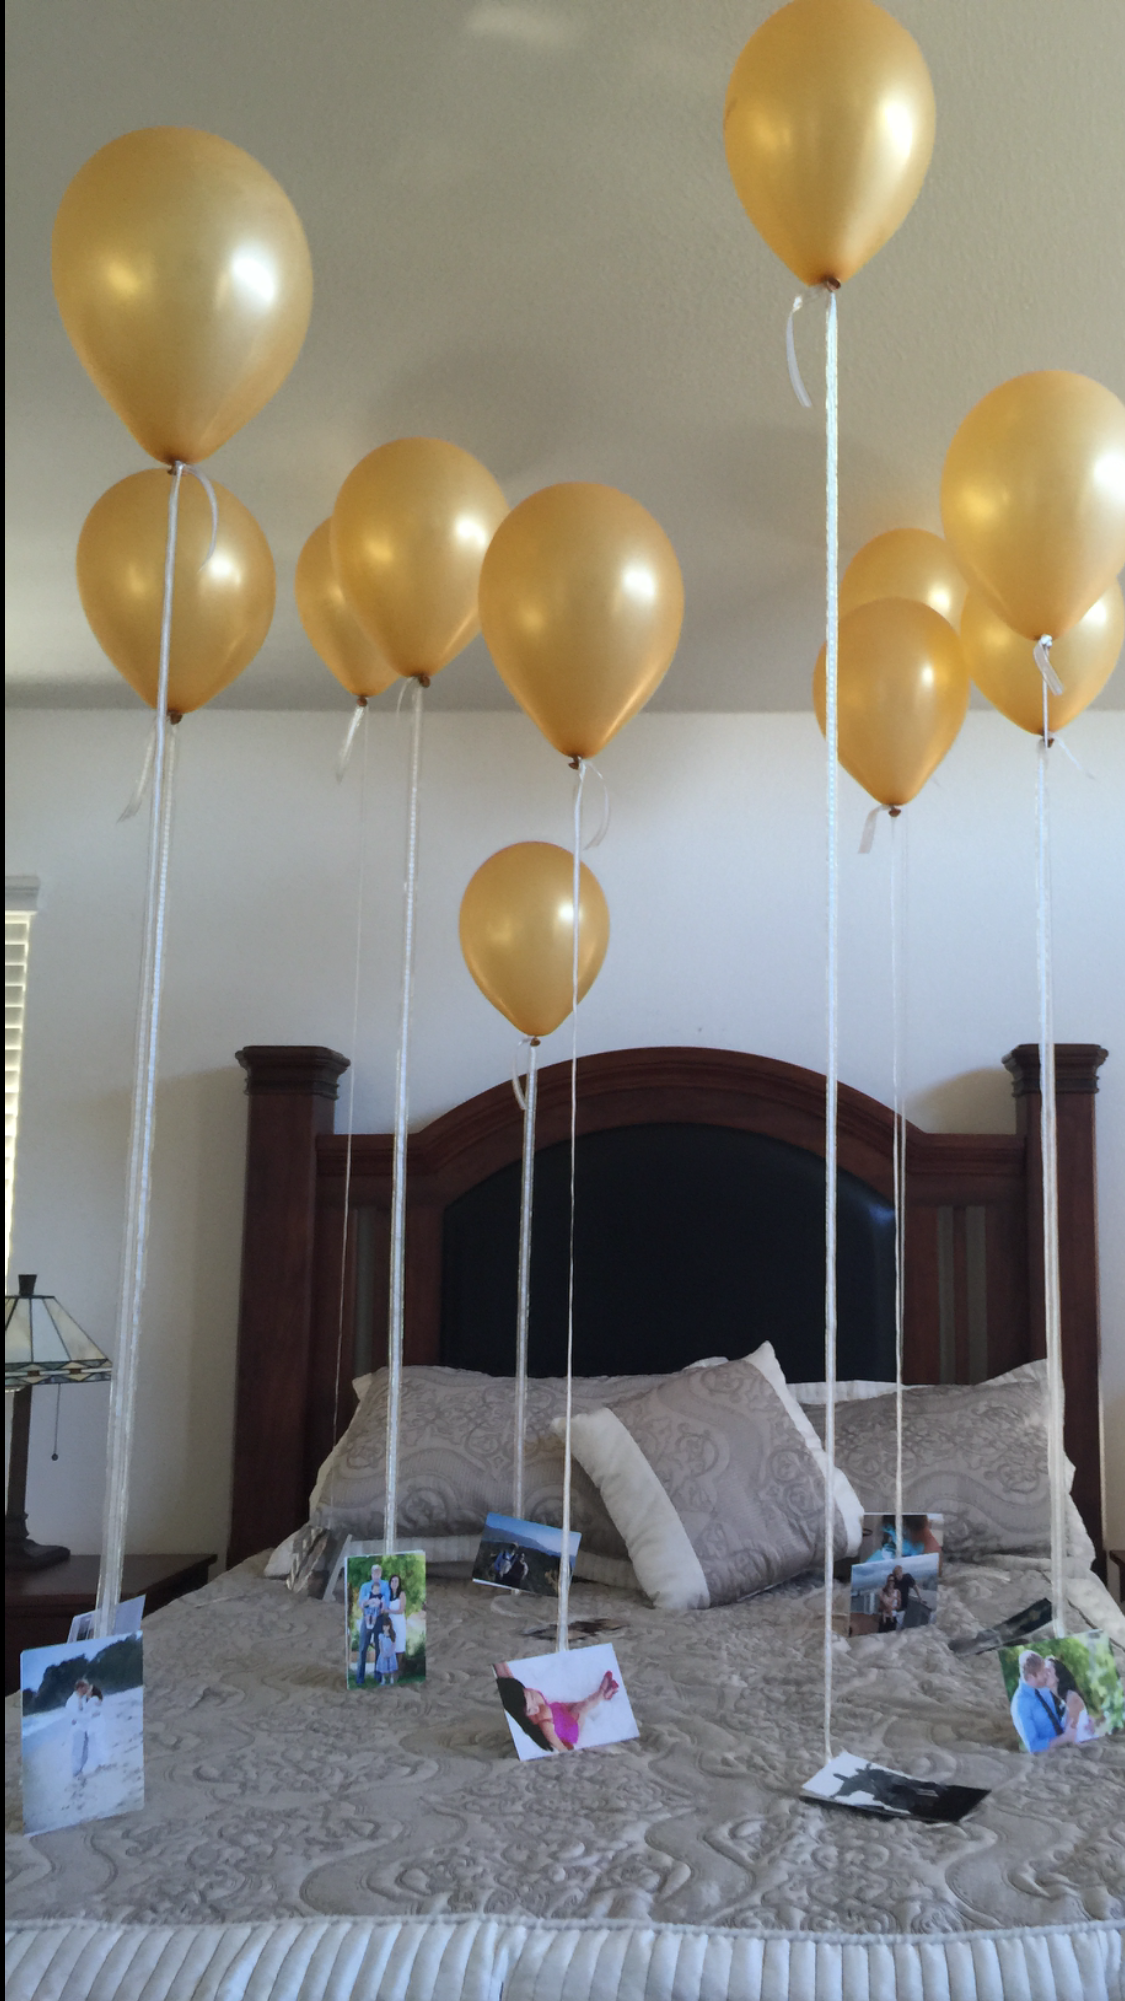 Pin By Zip Zip On Kassandra Birthday Ideas In 2020 Wedding Anniversary Surprises Anniversary Surprise Helium Balloons